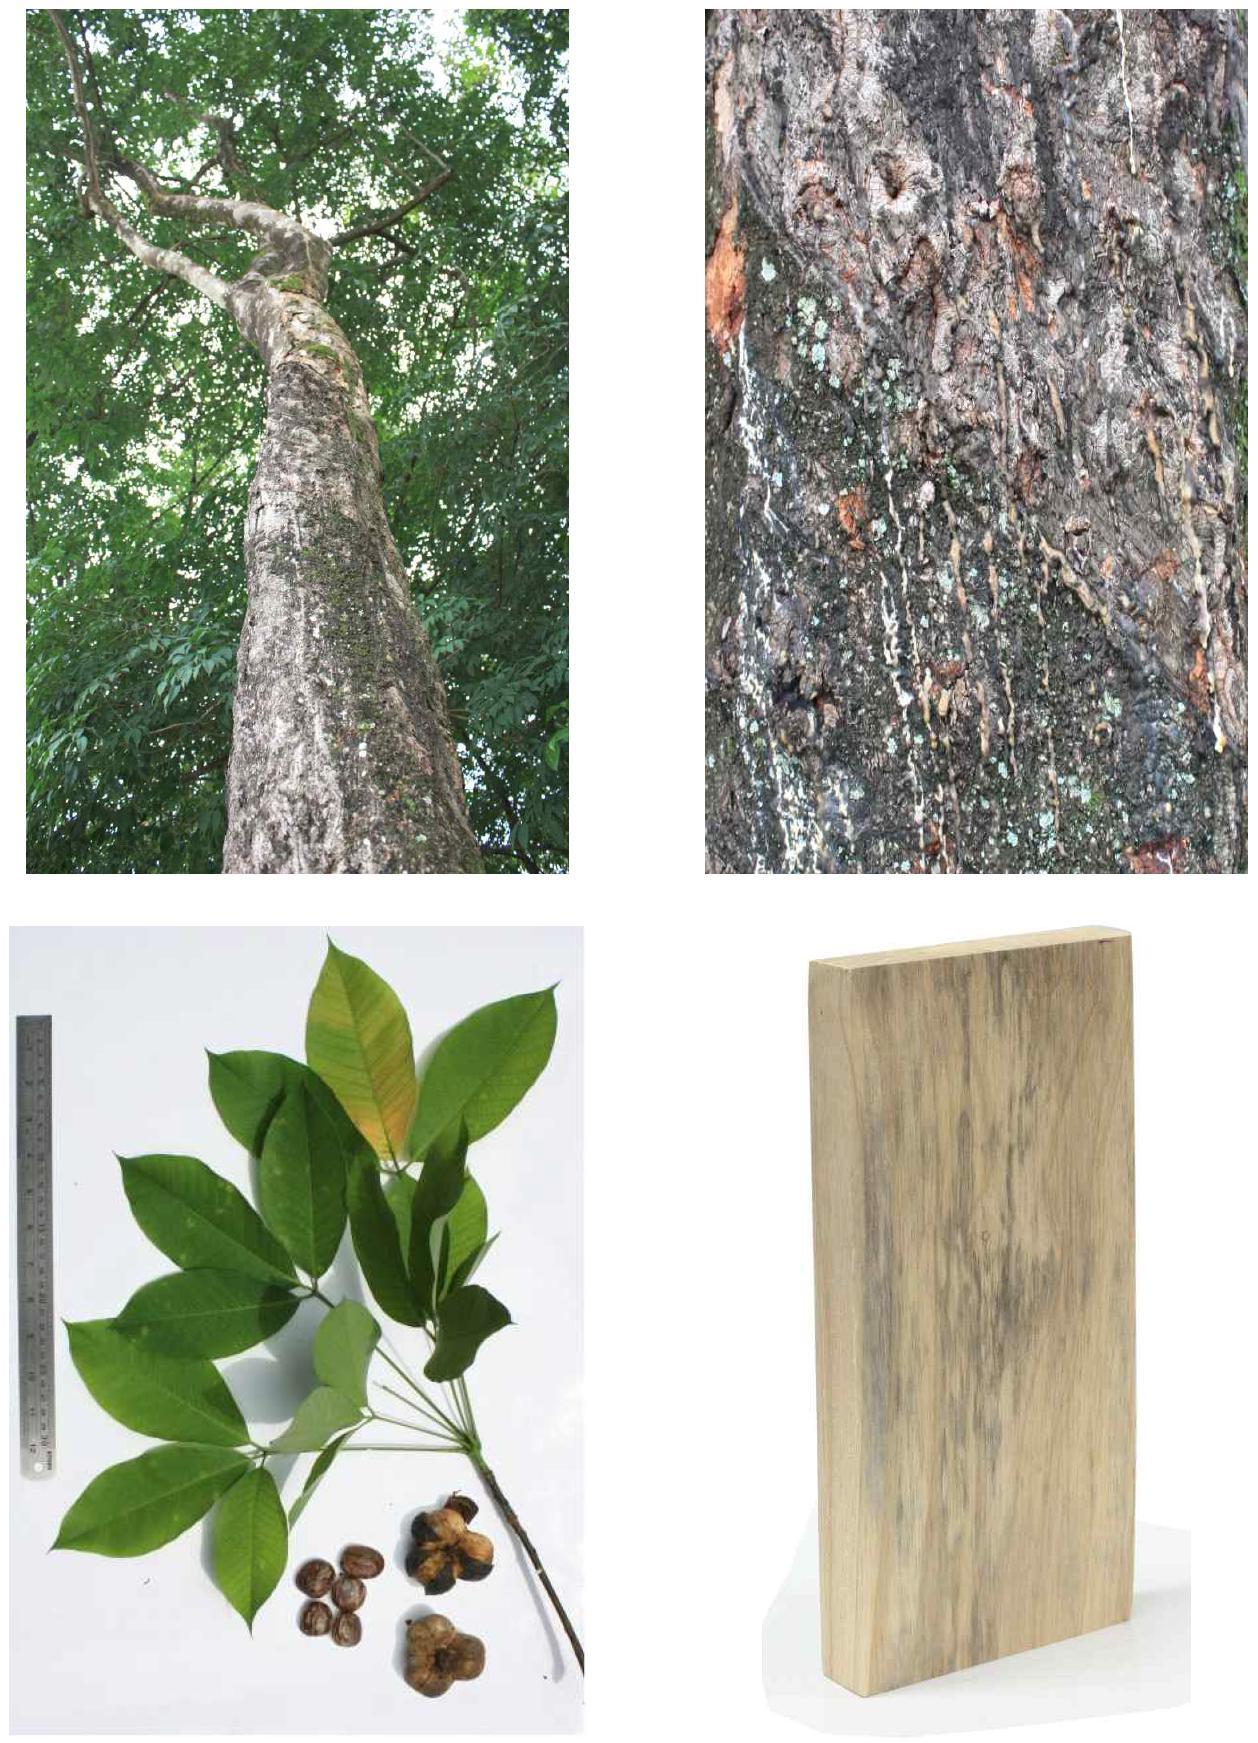 Rebber wood의 전체수형, 수피, 잎 및 재면.